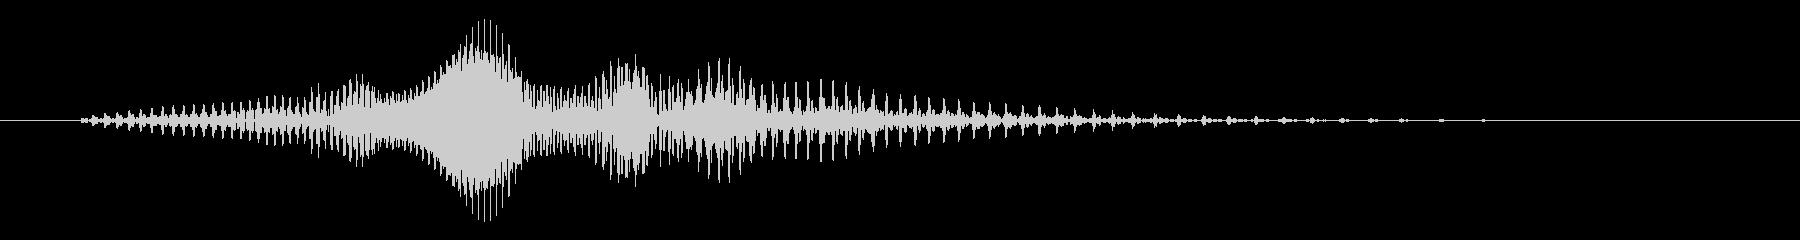 wow! (Bass voice)'s unreproduced waveform